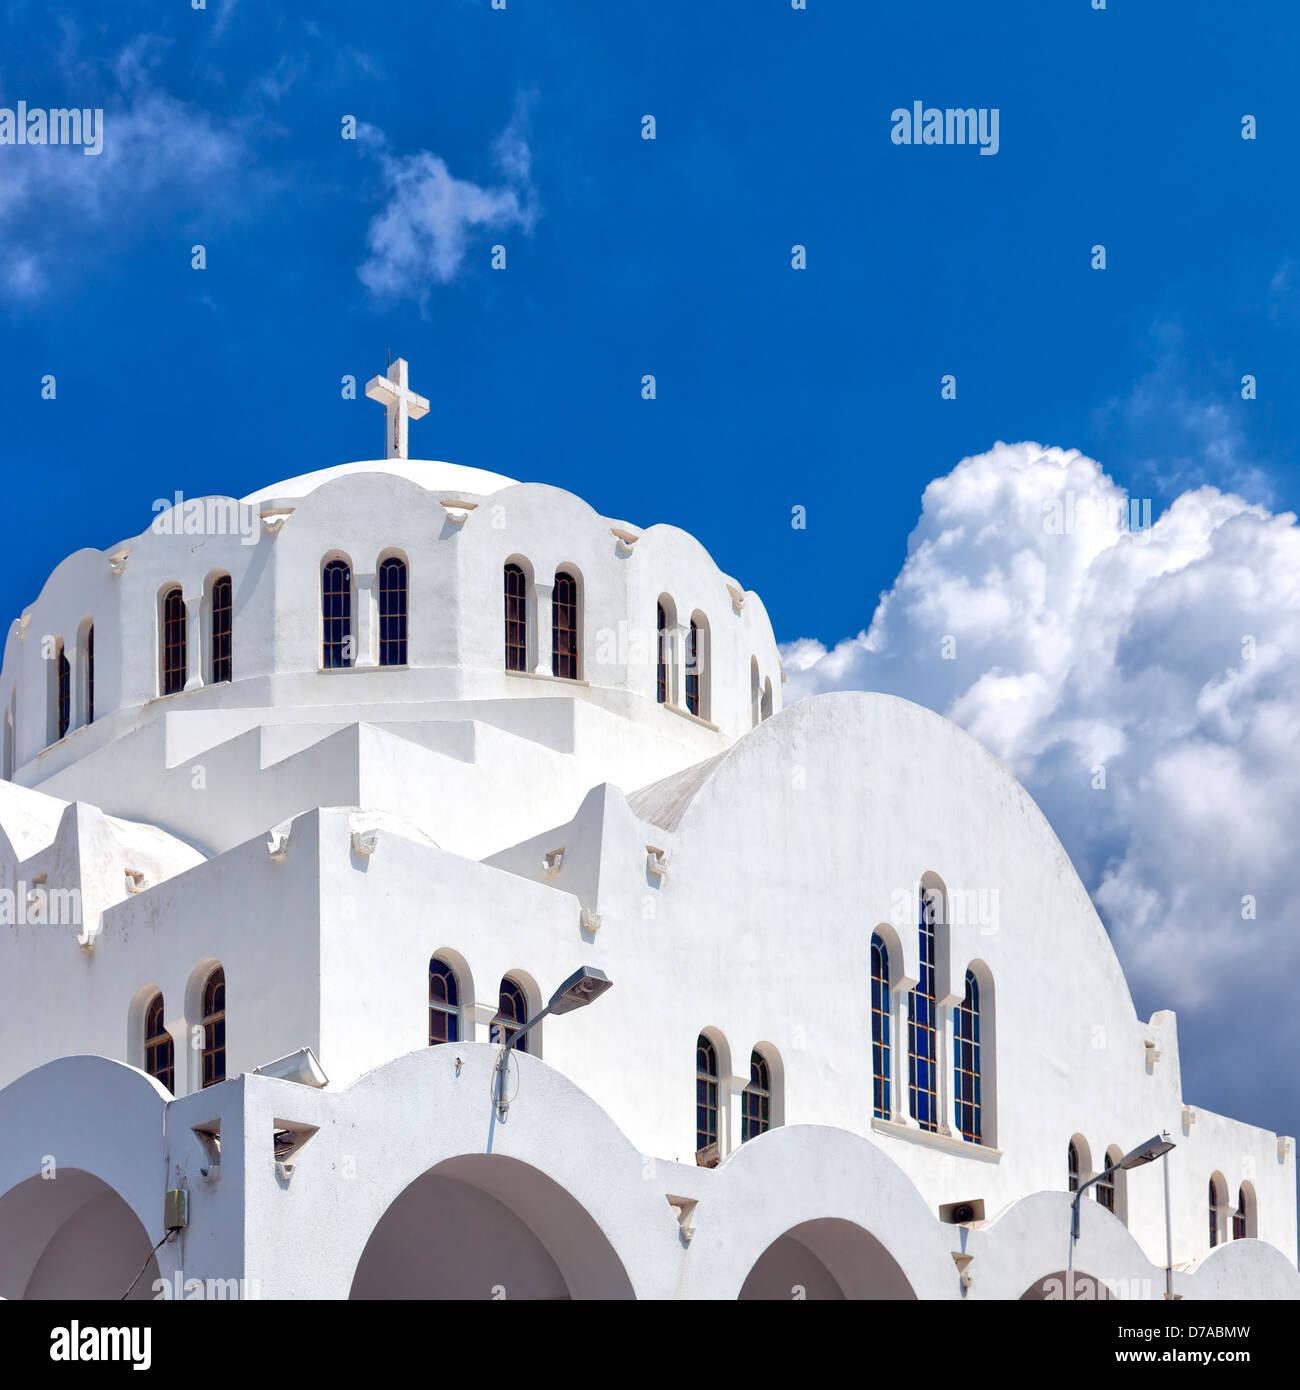 La Catedral Metropolitana ortodoxa situada en la ciudad de Fira, la capital de la isla griega de Santorini. Imagen De Stock